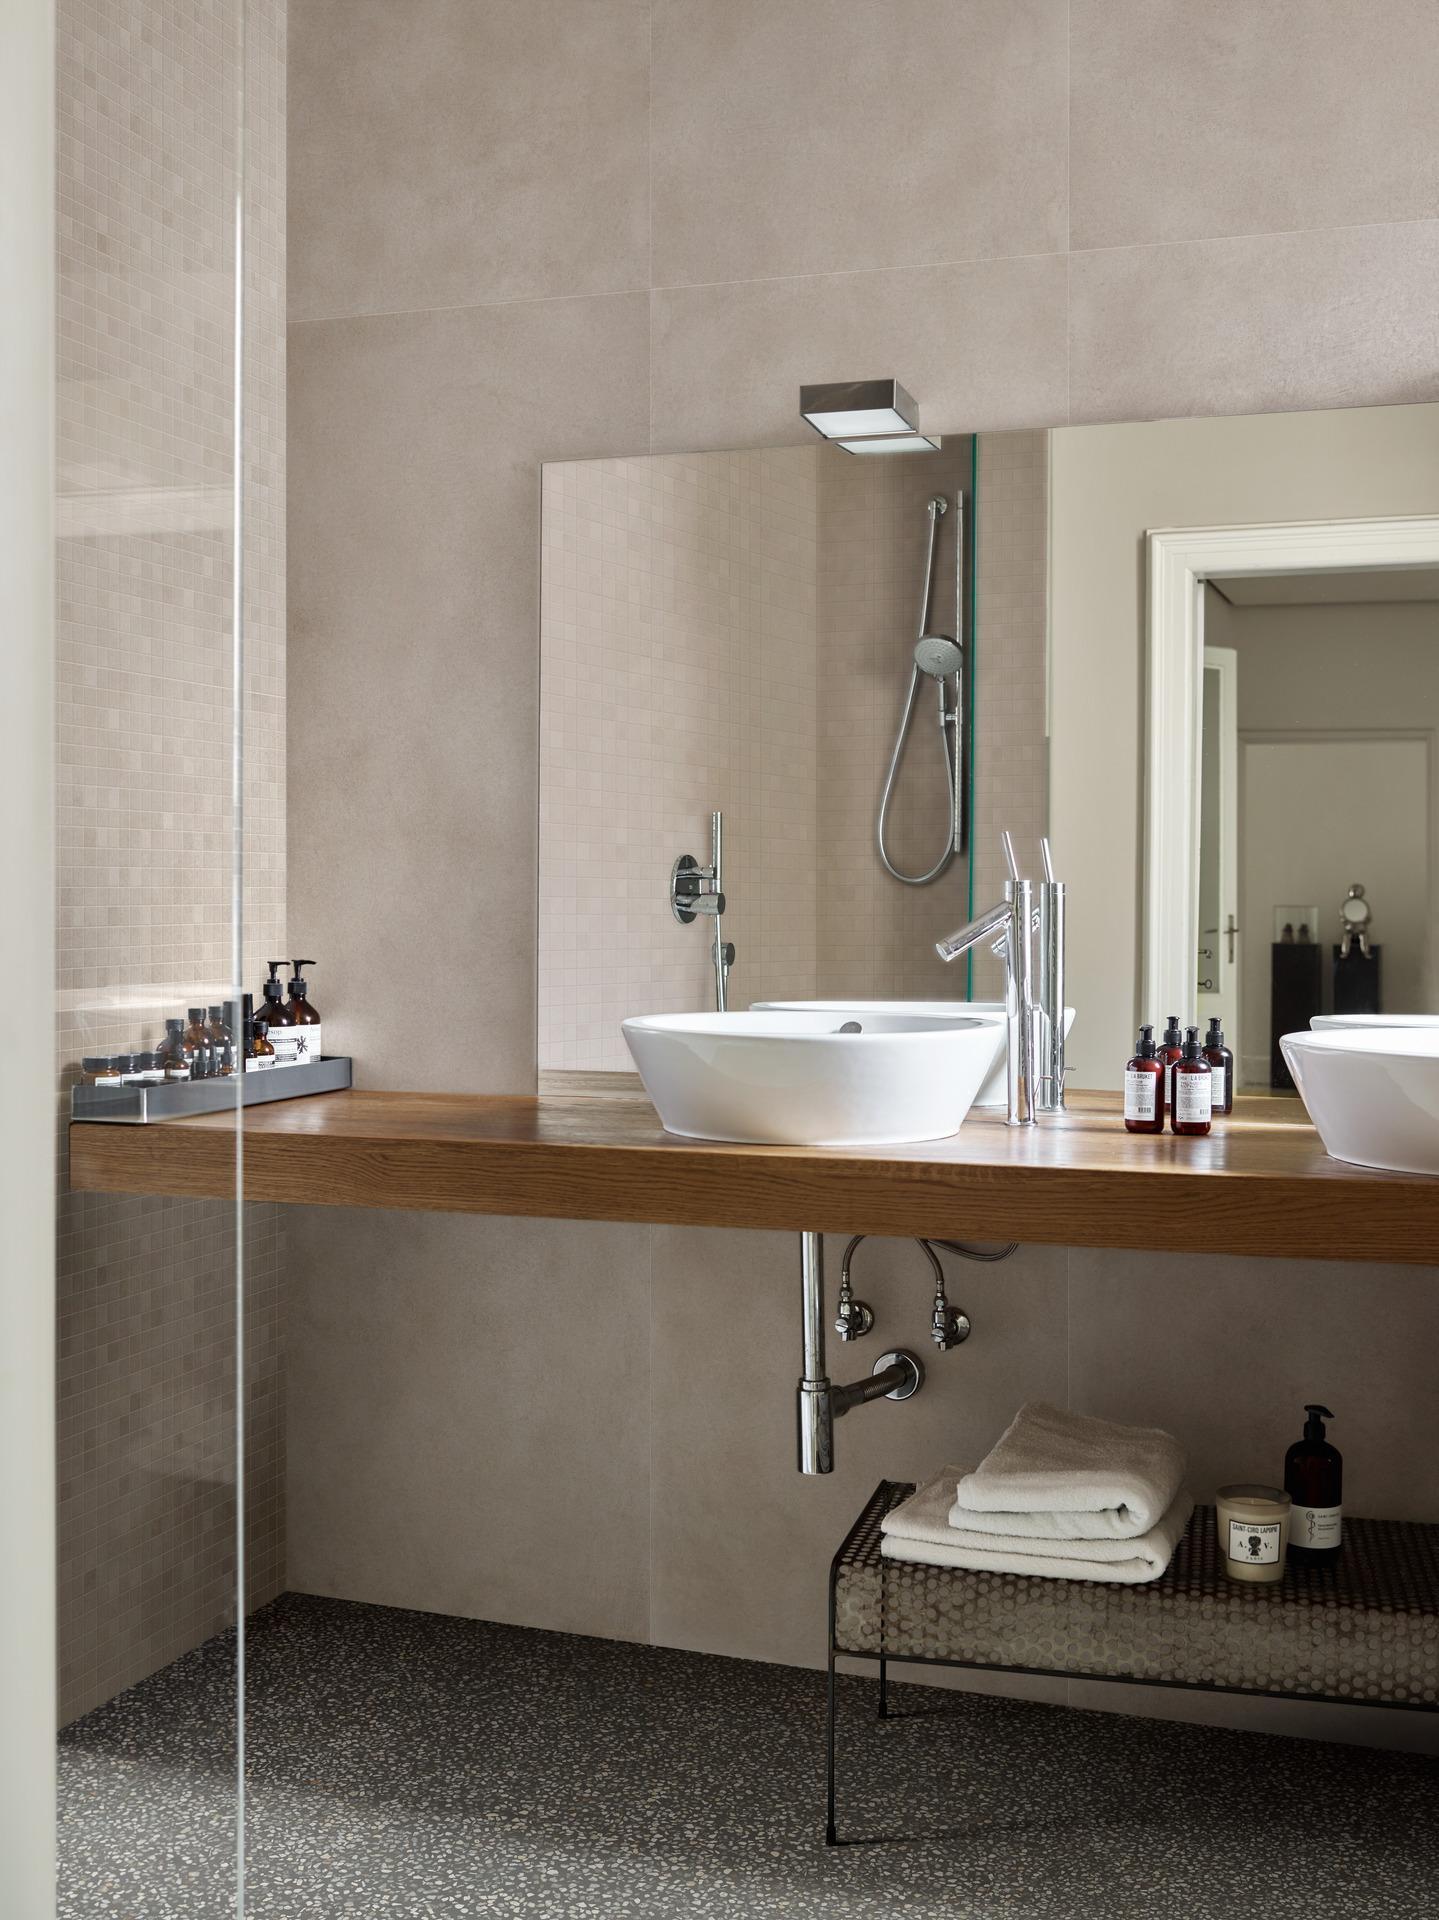 Alchimia: Slimline XL Size wall tiles   Marazzi on custom bathroom tile, bathroom tile around vanity, glass tile, basement bathroom tile, bathroom stone tile, bathroom light tile, bathroom ideas tile, bathroom walls tile, small bathroom tile, bathroom design, bathroom remodel tile, bathroom paint tile, bathroom wood tile, shower tile, bathroom accessories tile, bathroom ideas for small bathrooms, granite tile, bathroom tiles product, bathroom stick tile, bathroom tile vanity top,